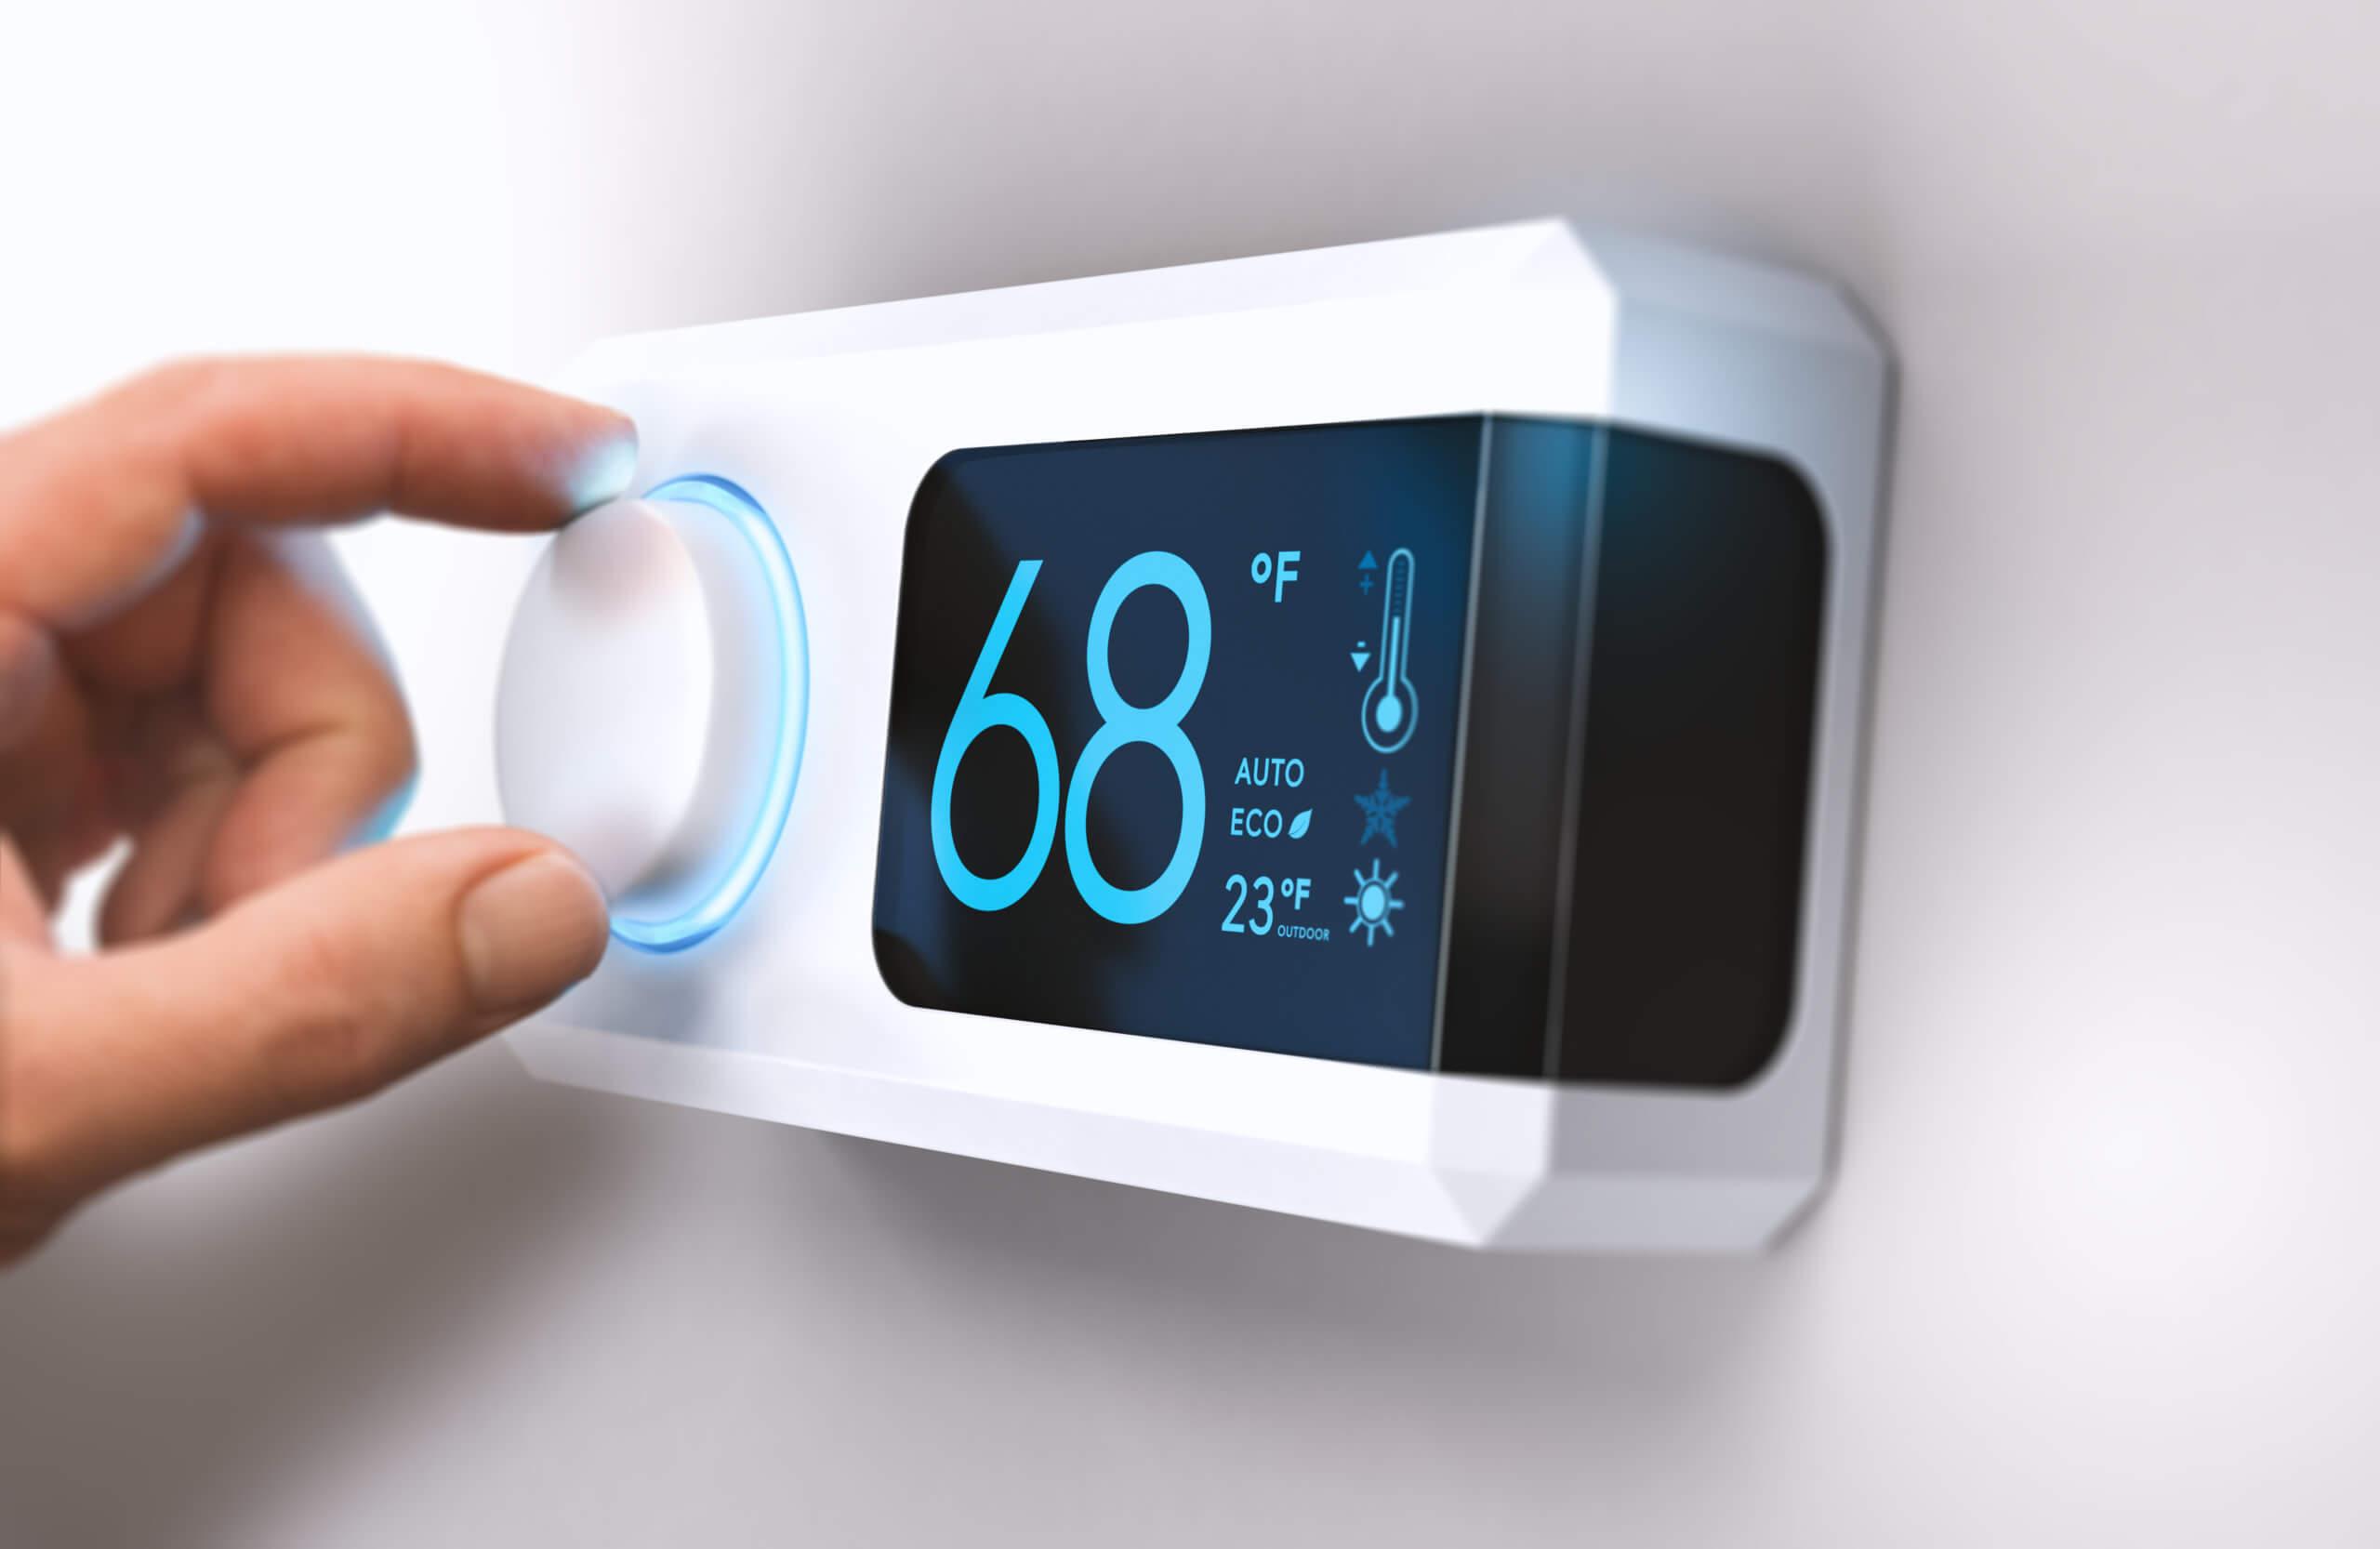 Forced Air Temperature Control